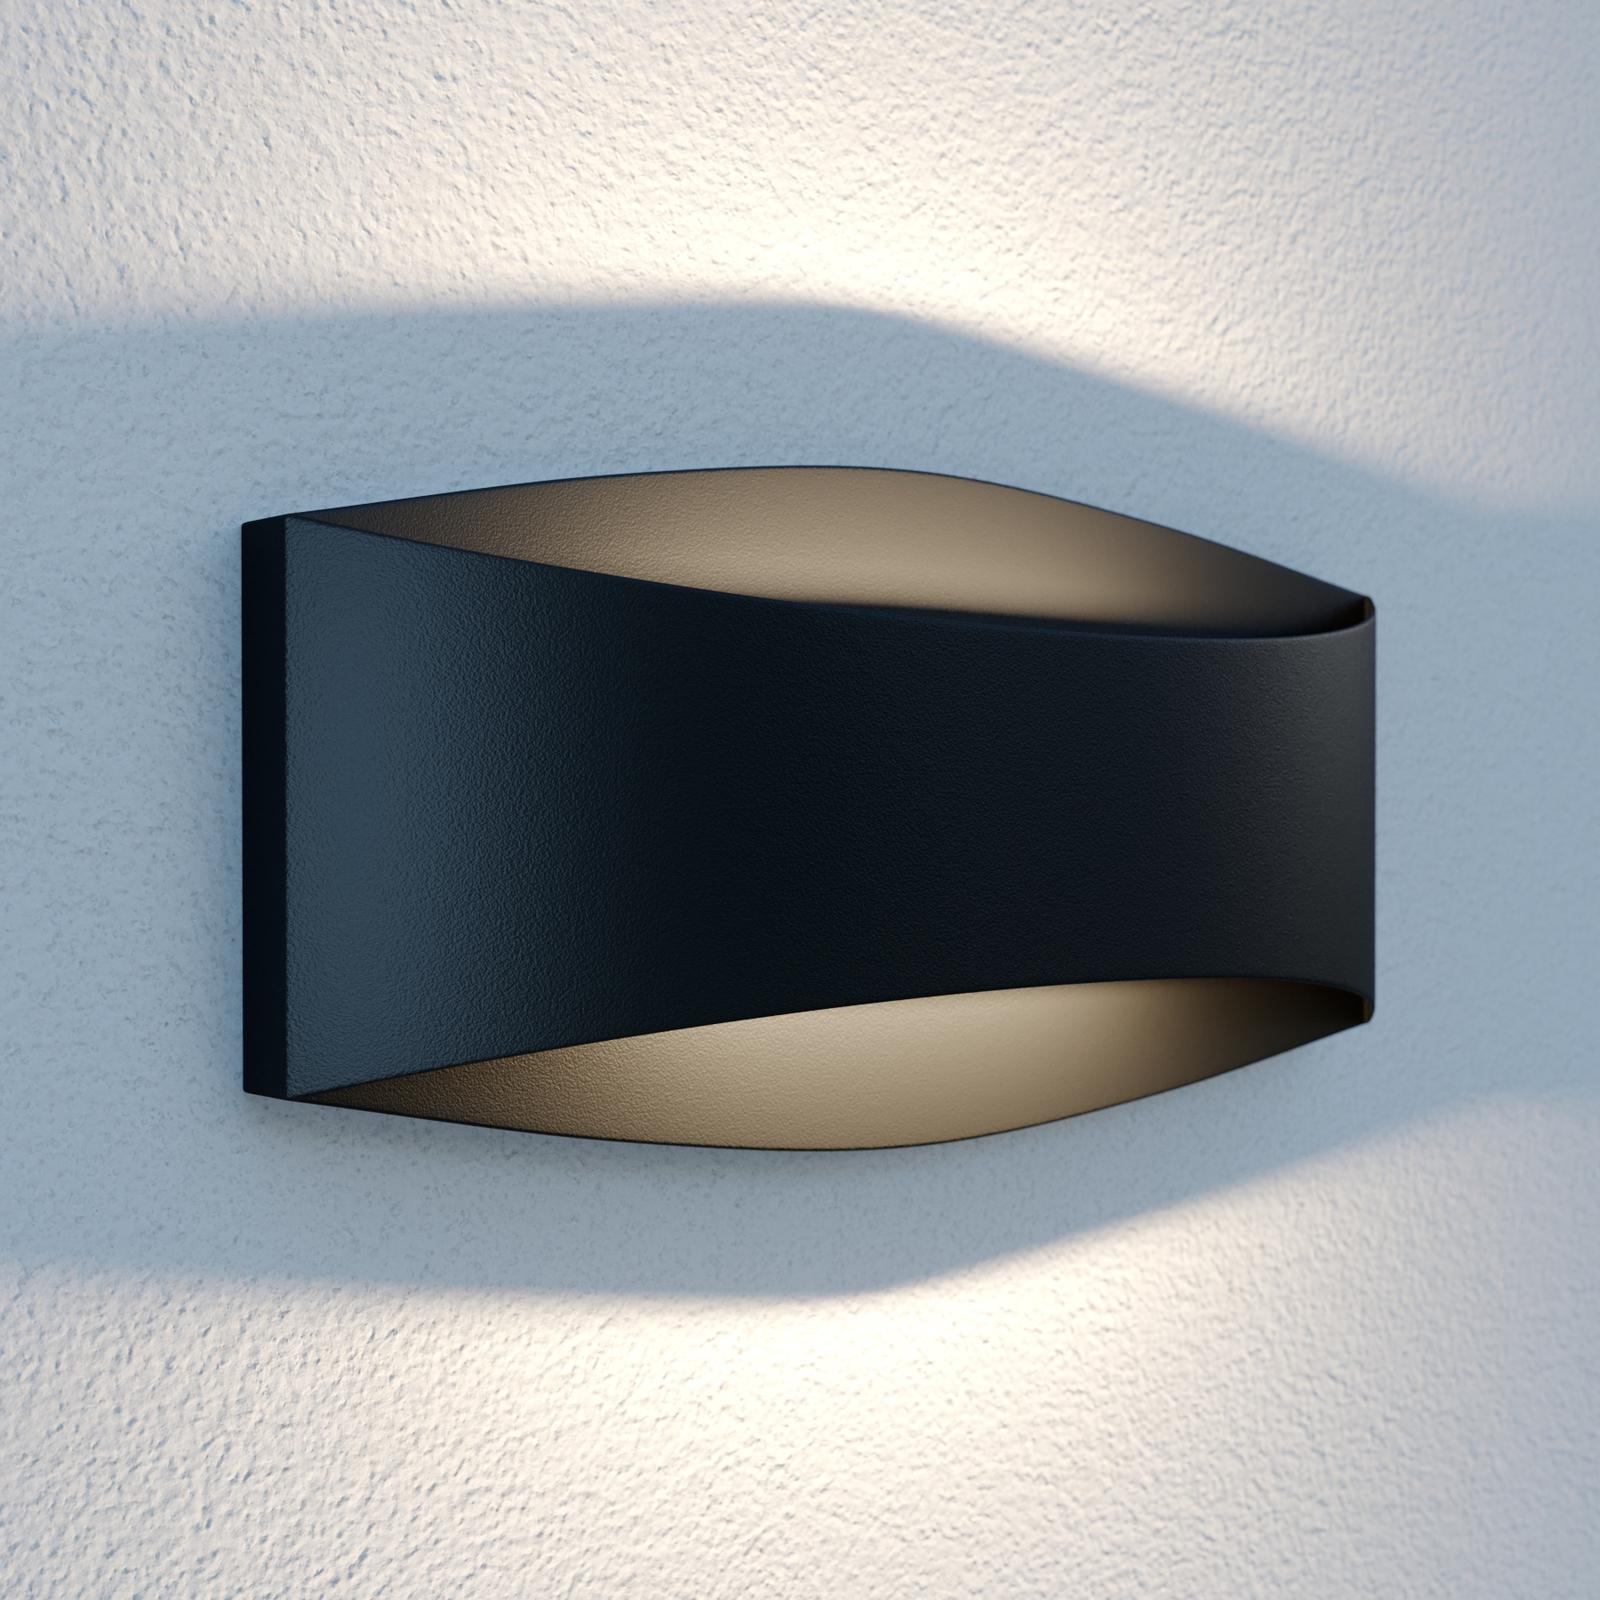 Lindby Evric kinkiet zewnętrzny LED, 25,4 cm